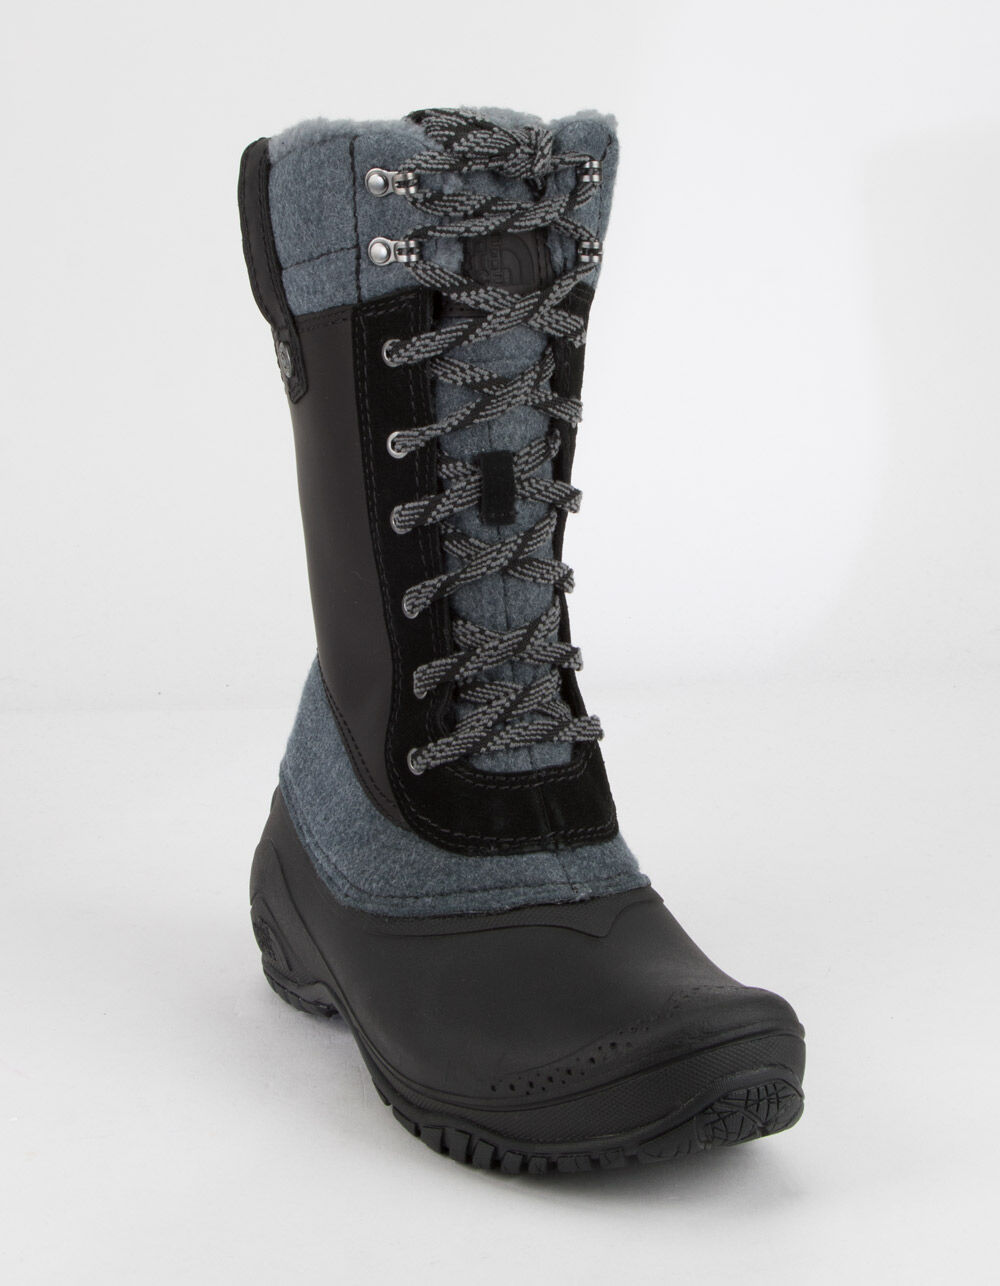 THE NORTH FACE Shellista III Mid Black Boots